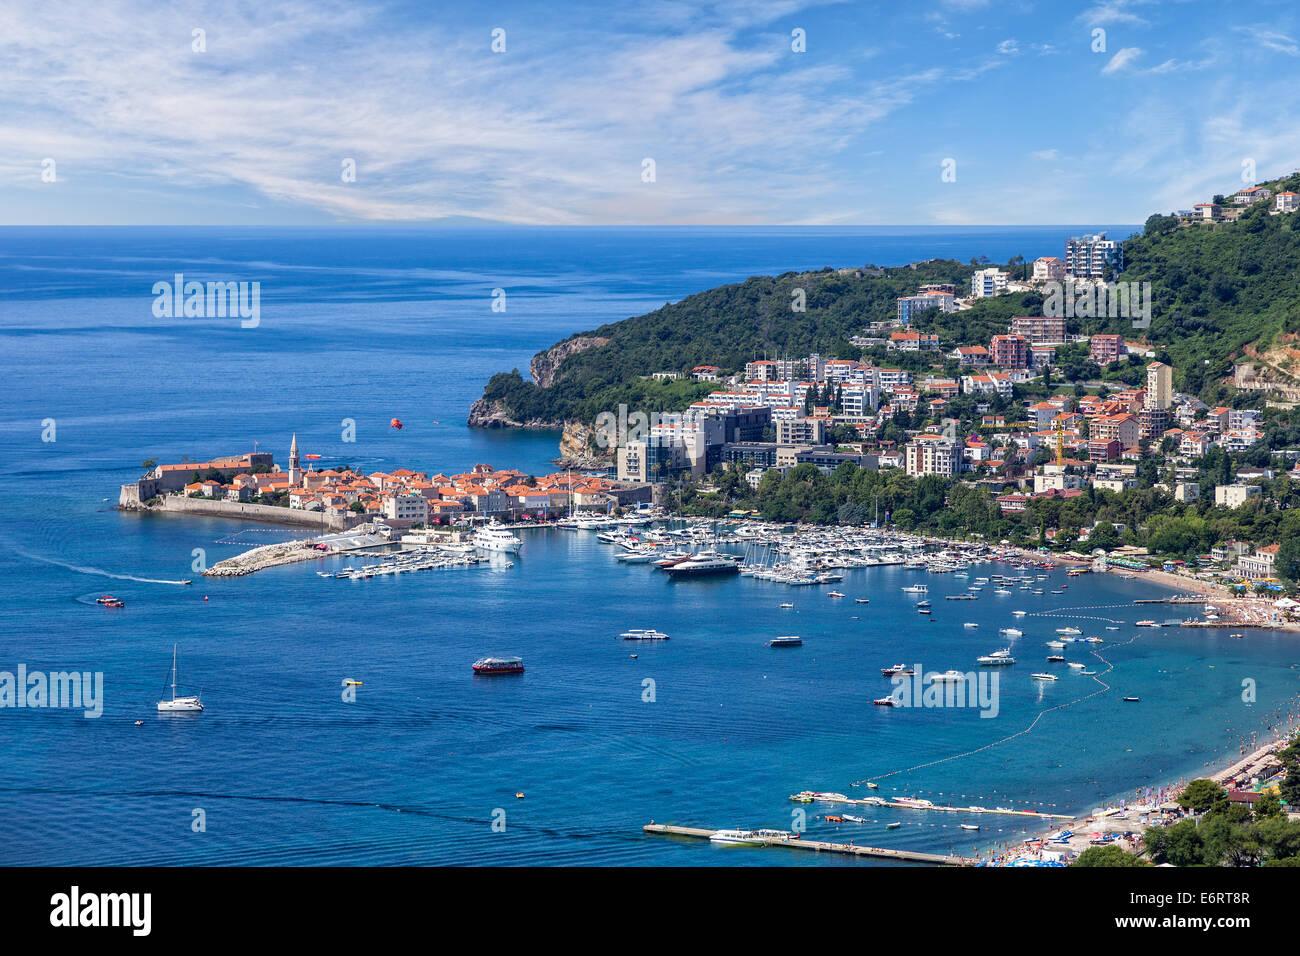 Top view of the seacoast of Budva, Montenegro. Stock Photo